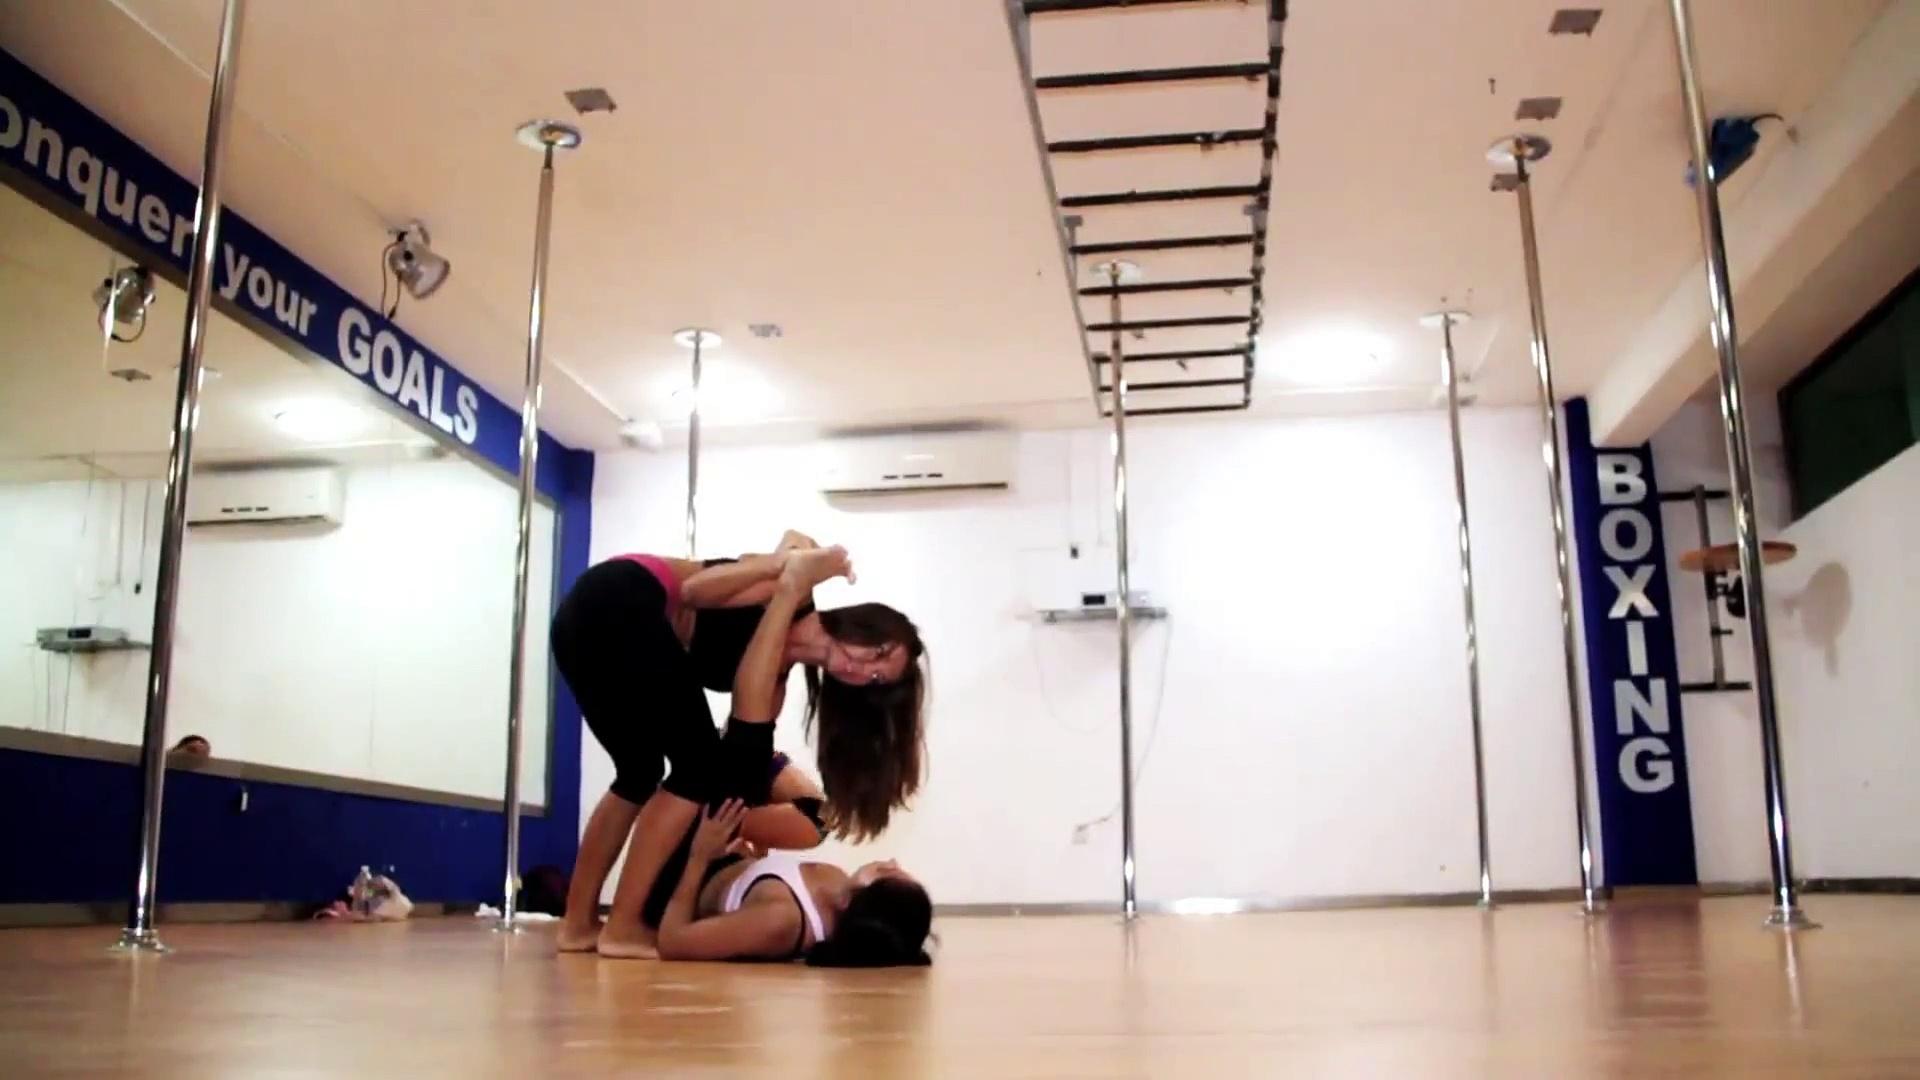 SEXY DANCE DEPORTE OLIMPICO POLE FITNESS TRAILER _ ASTRID VLOGS Datos Curiosos